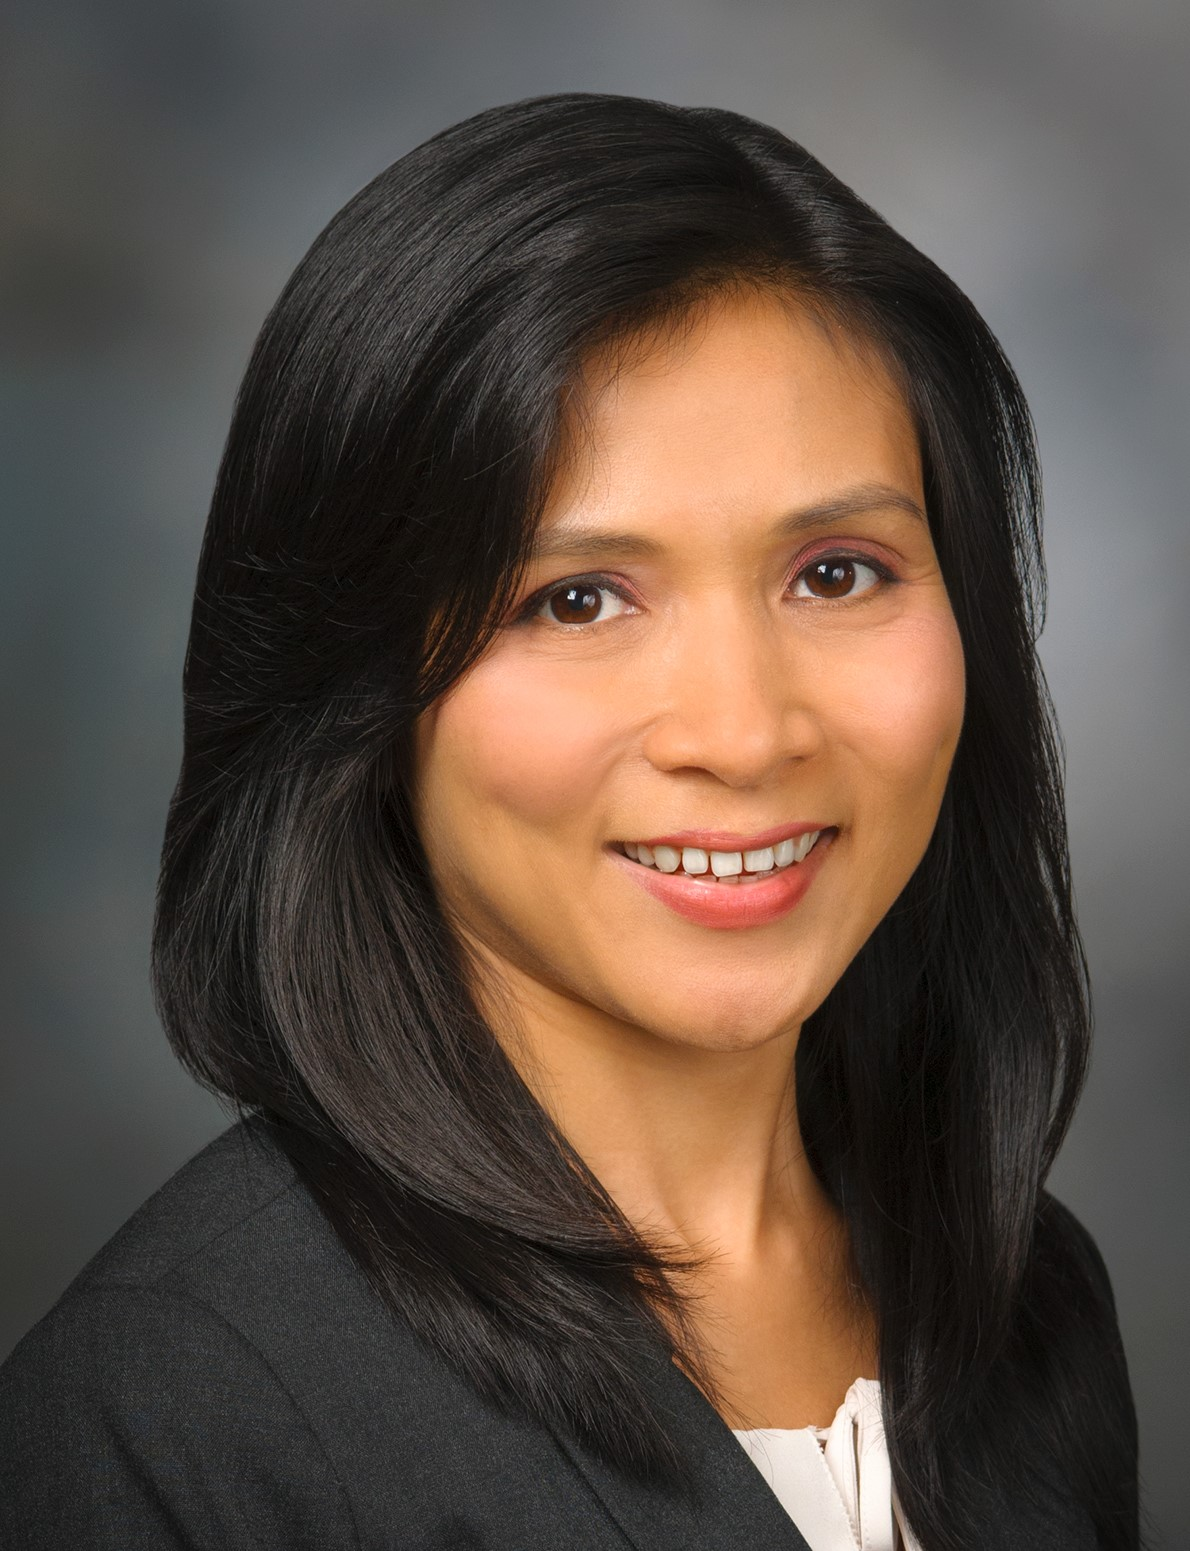 Phyu Aung, M.D., Ph.D.